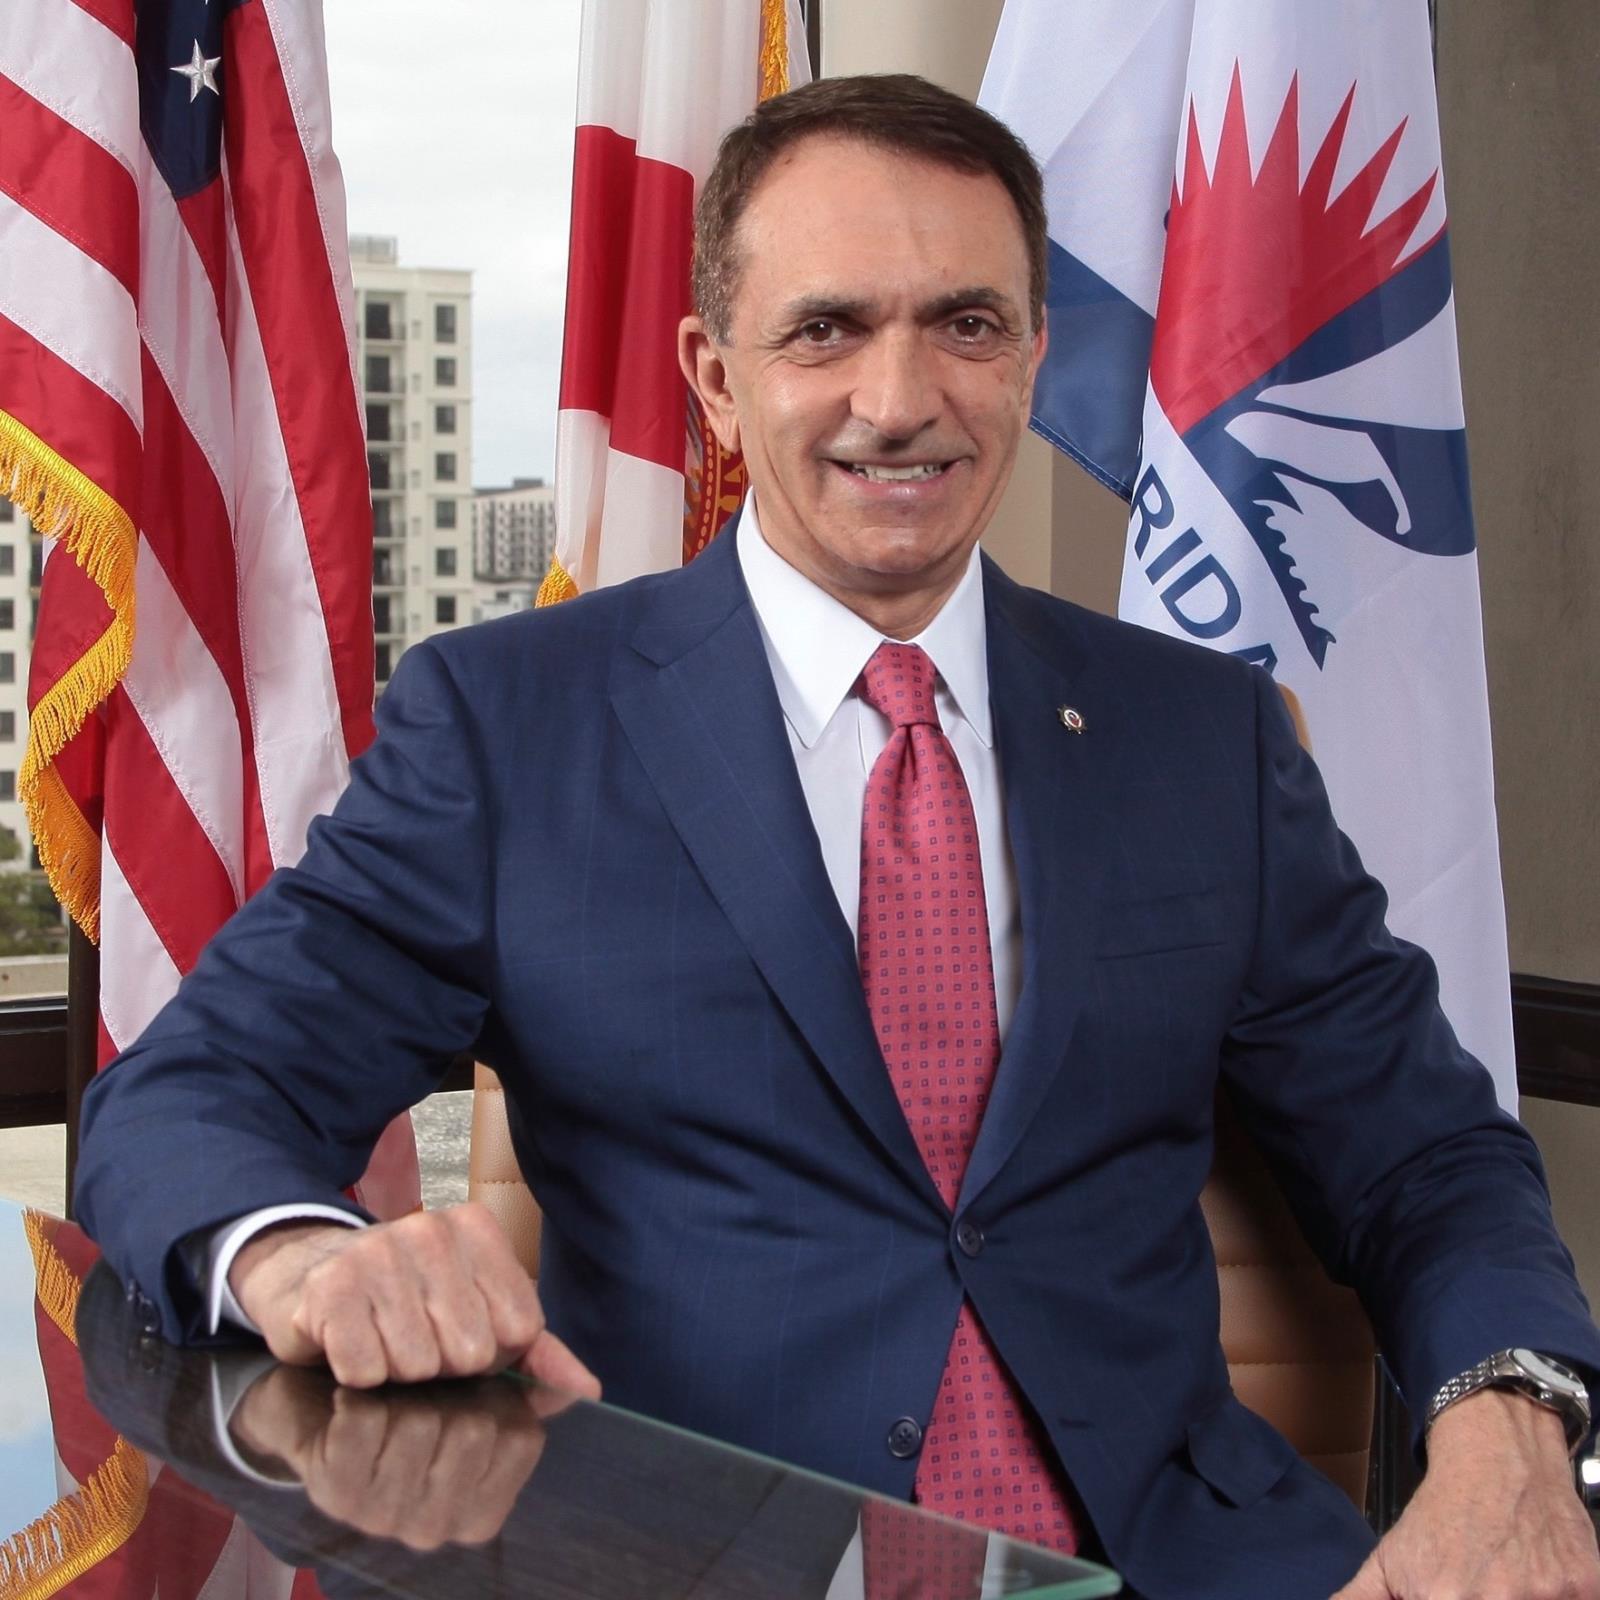 Mayor Dean J. Trantalis | City of Fort Lauderdale, FL